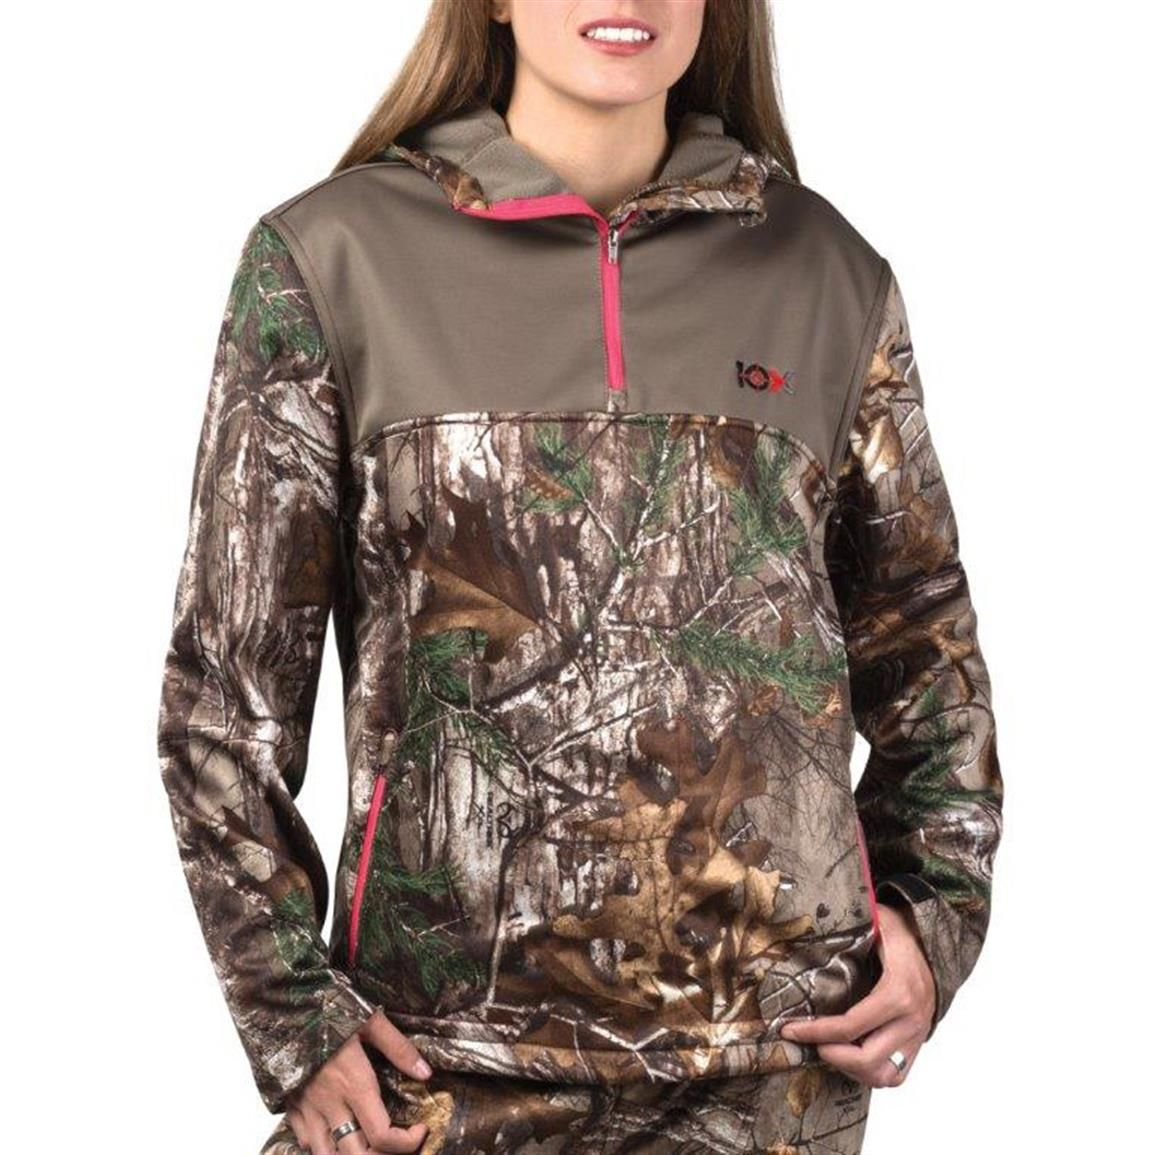 women s walls 10x tech hoodie tech hoodie women s on walls hunting coveralls id=27388